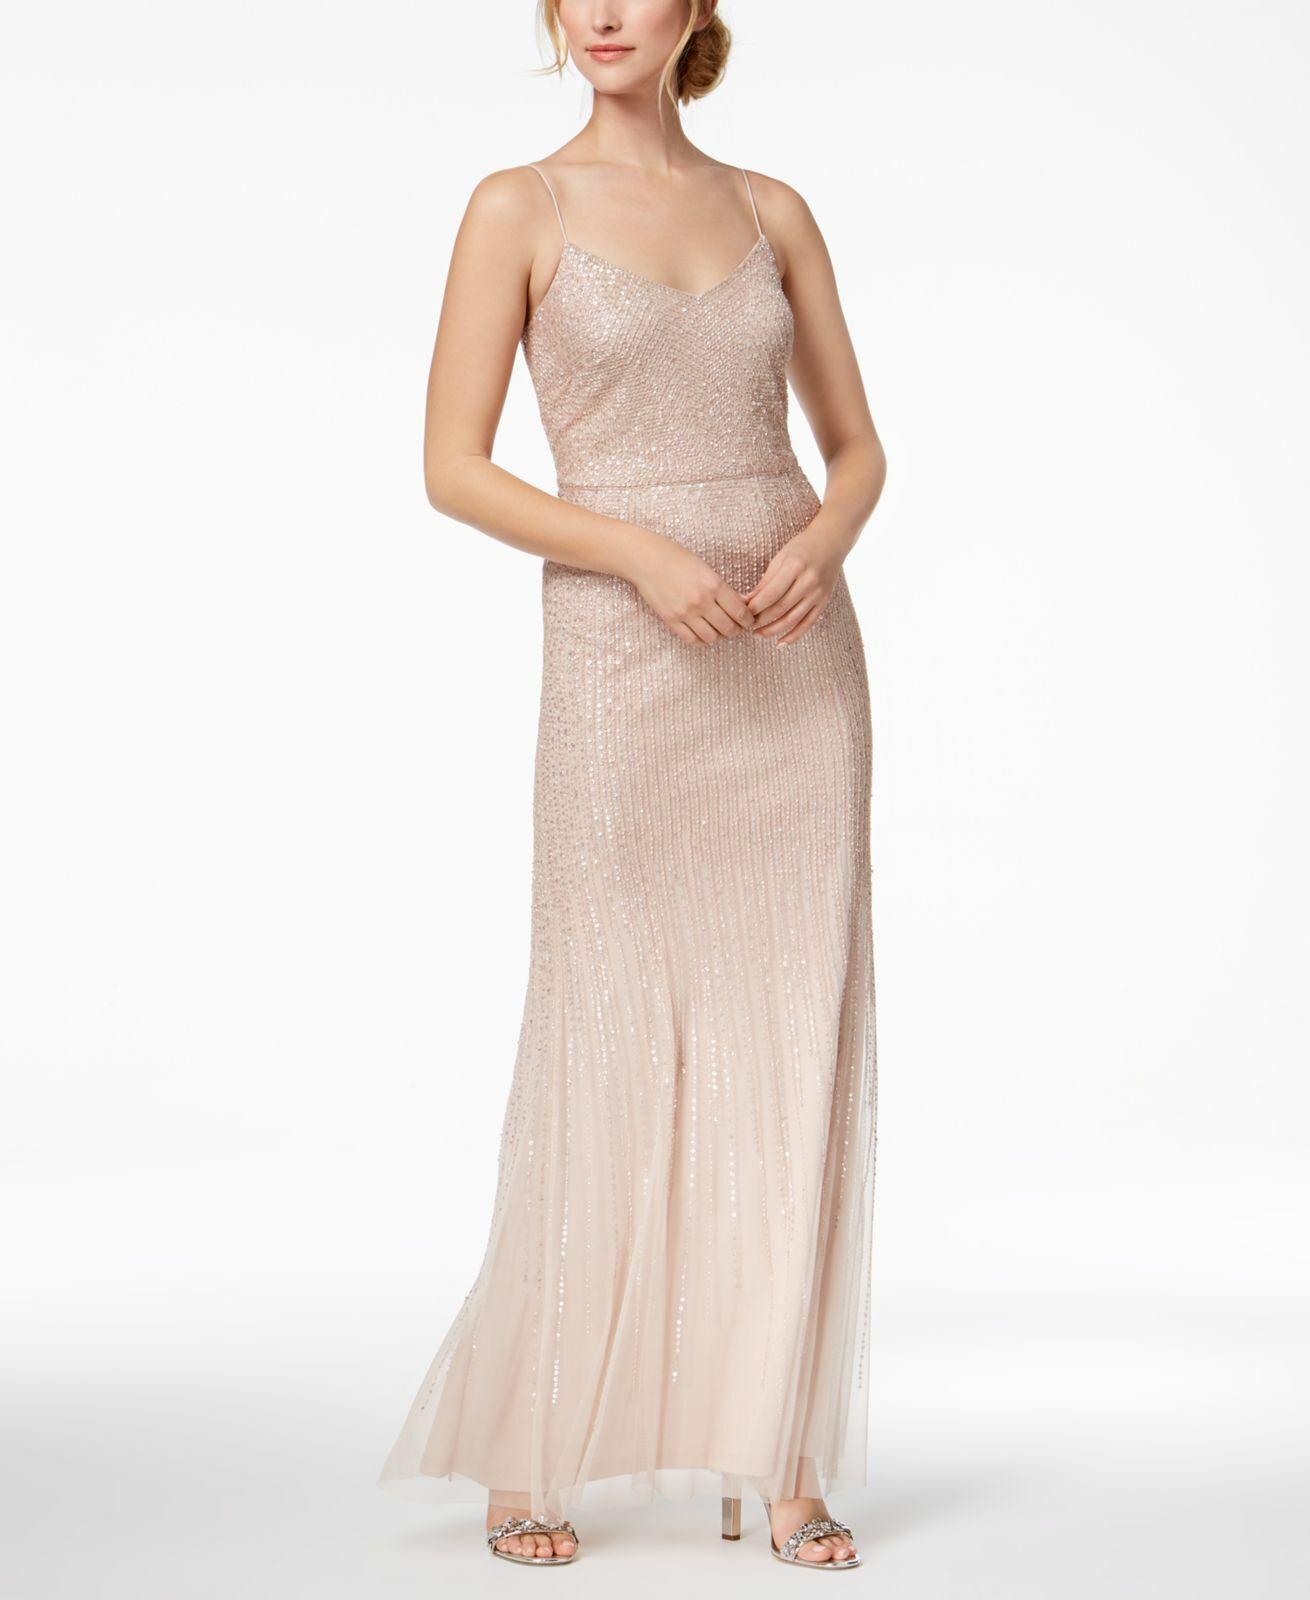 ADRIANNA PAPELL damen Rosa EMBELLISHED SLEEVELESS GOWN FORMAL DRESS Größe 12